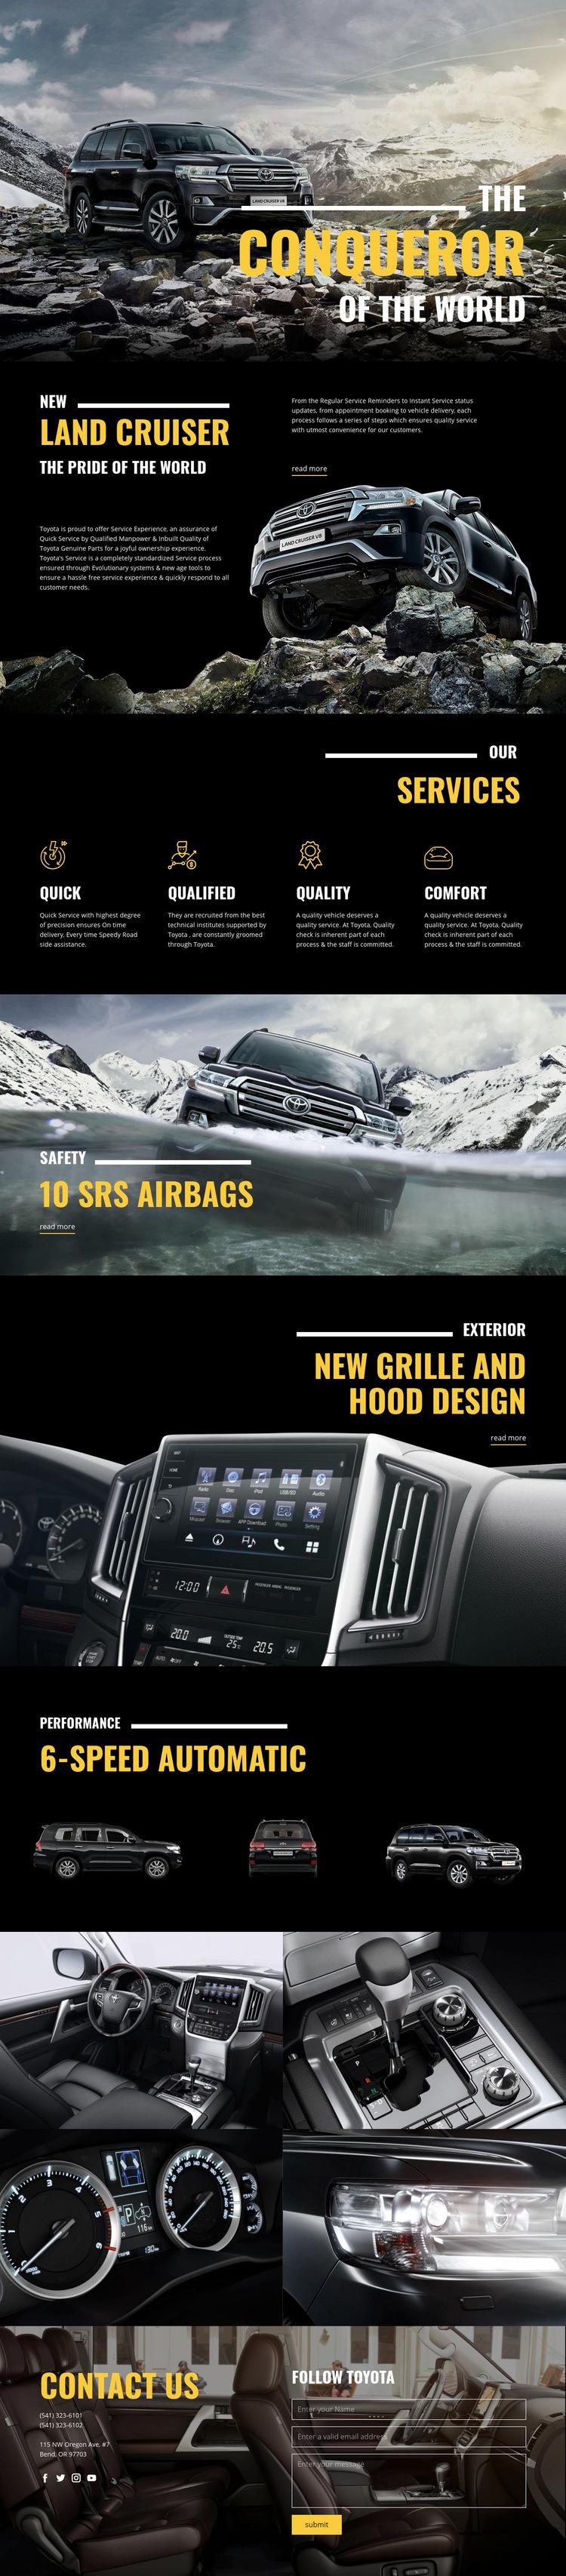 Land Cruiser conqueror car Web Page Design